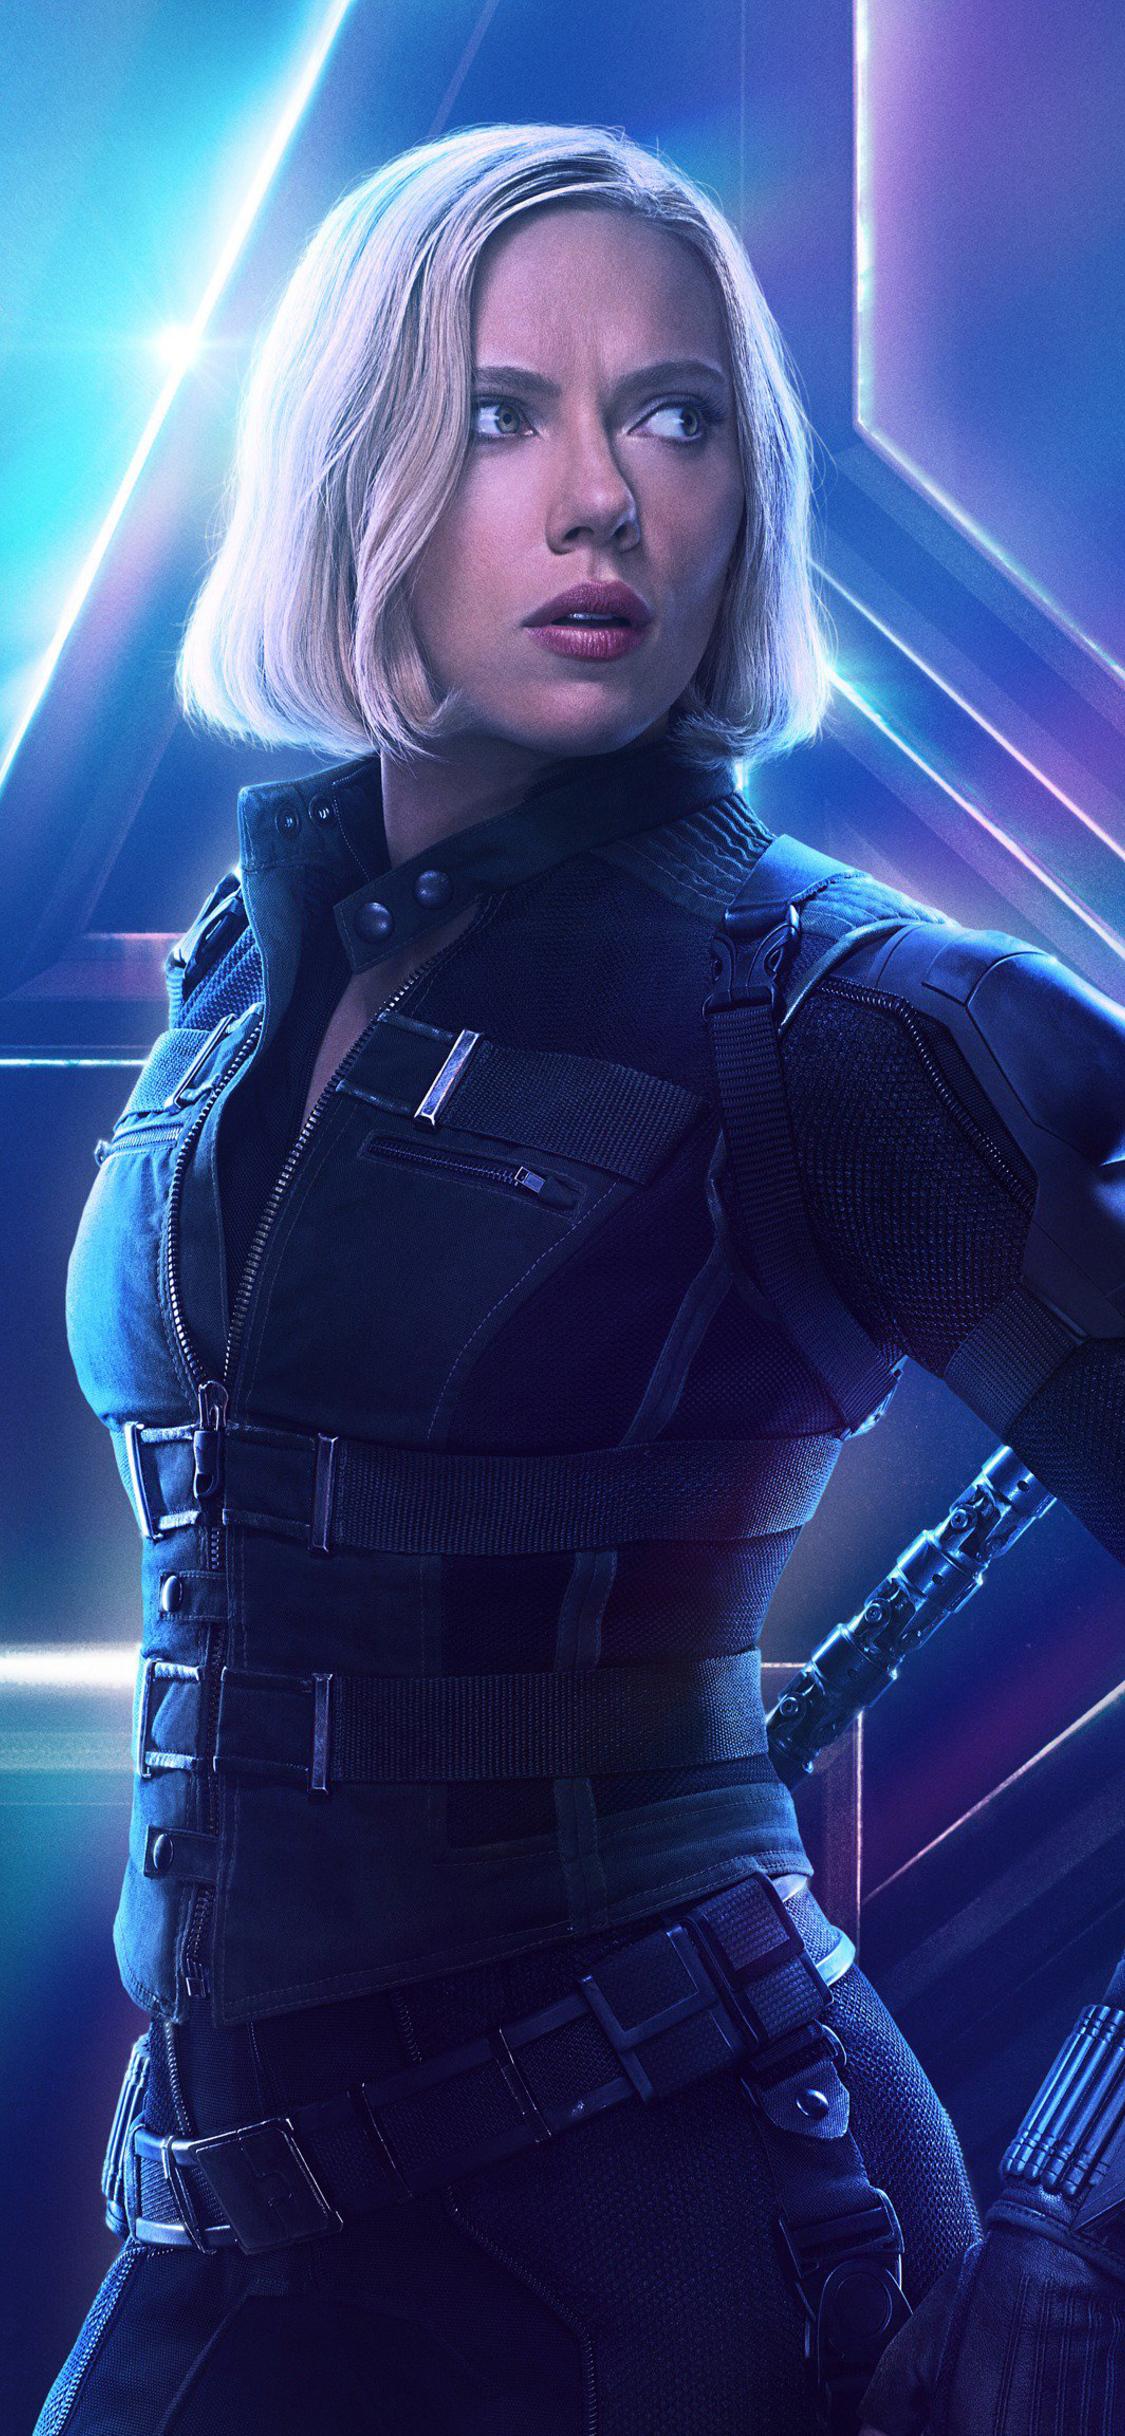 1125x2436 Black Widow In Avengers Infinity War New Poster ...